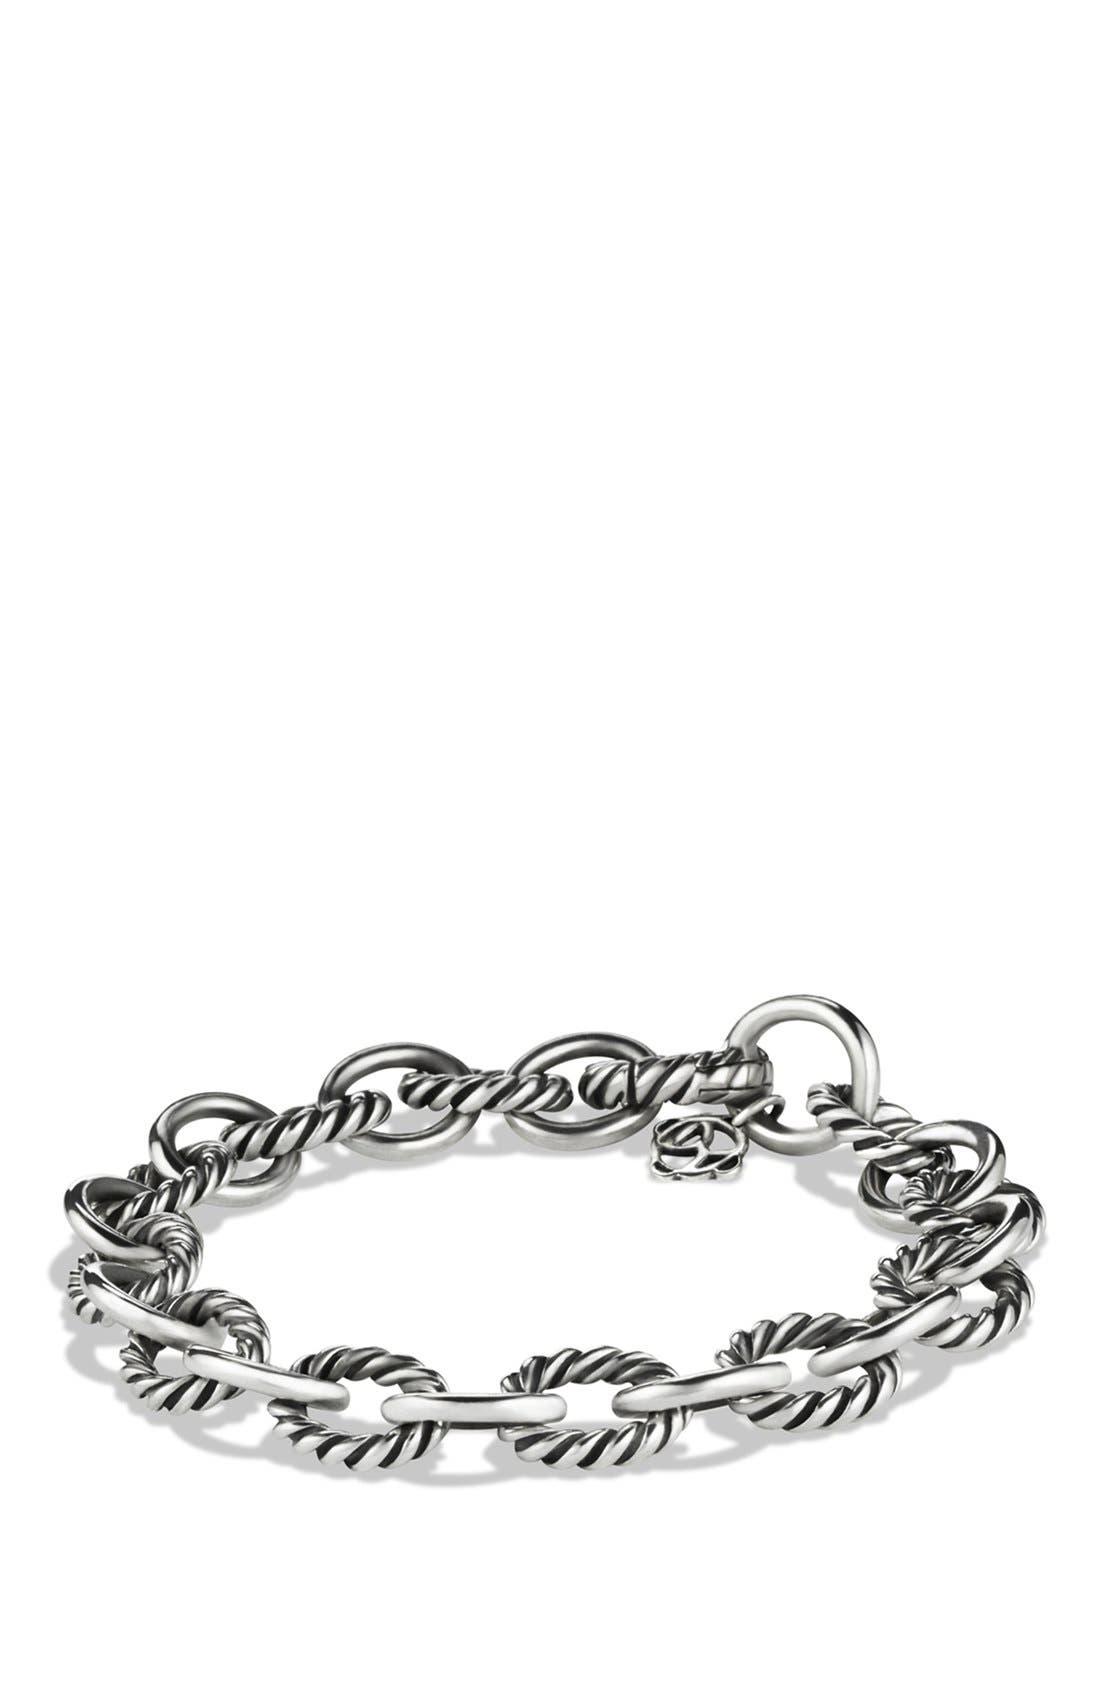 Main Image - David Yurman 'Oval' Link Bracelet